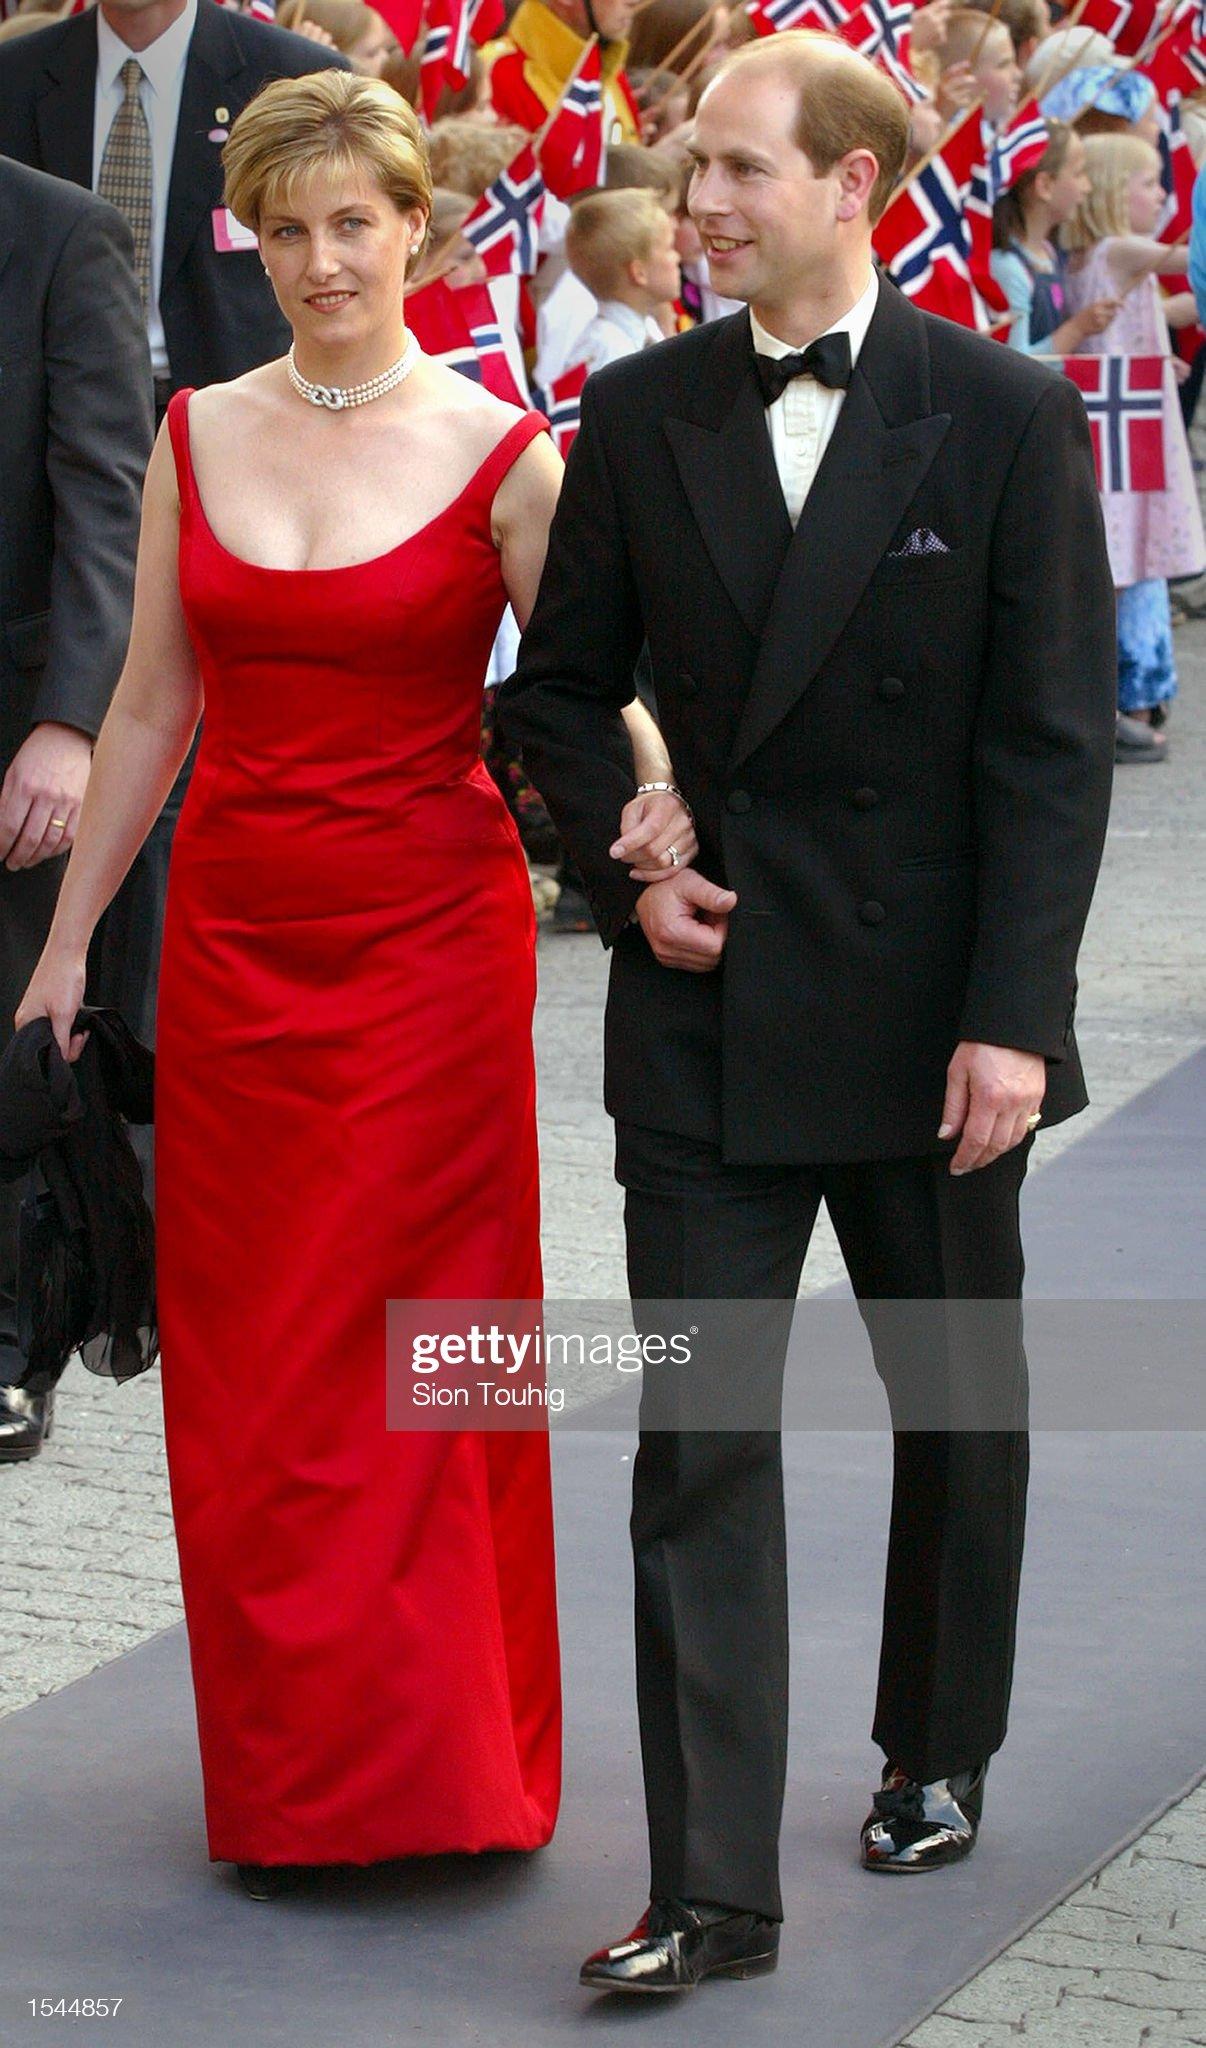 Norwegian Royal Wedding. : News Photo